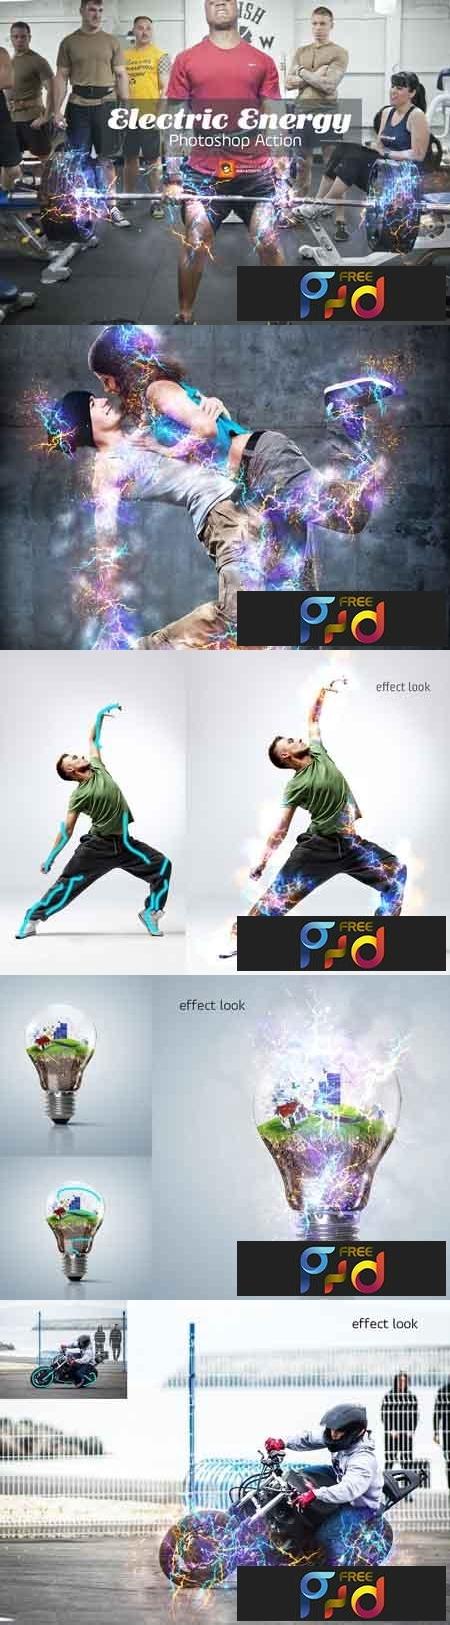 Electric Energy Photoshop Action 3451692 1